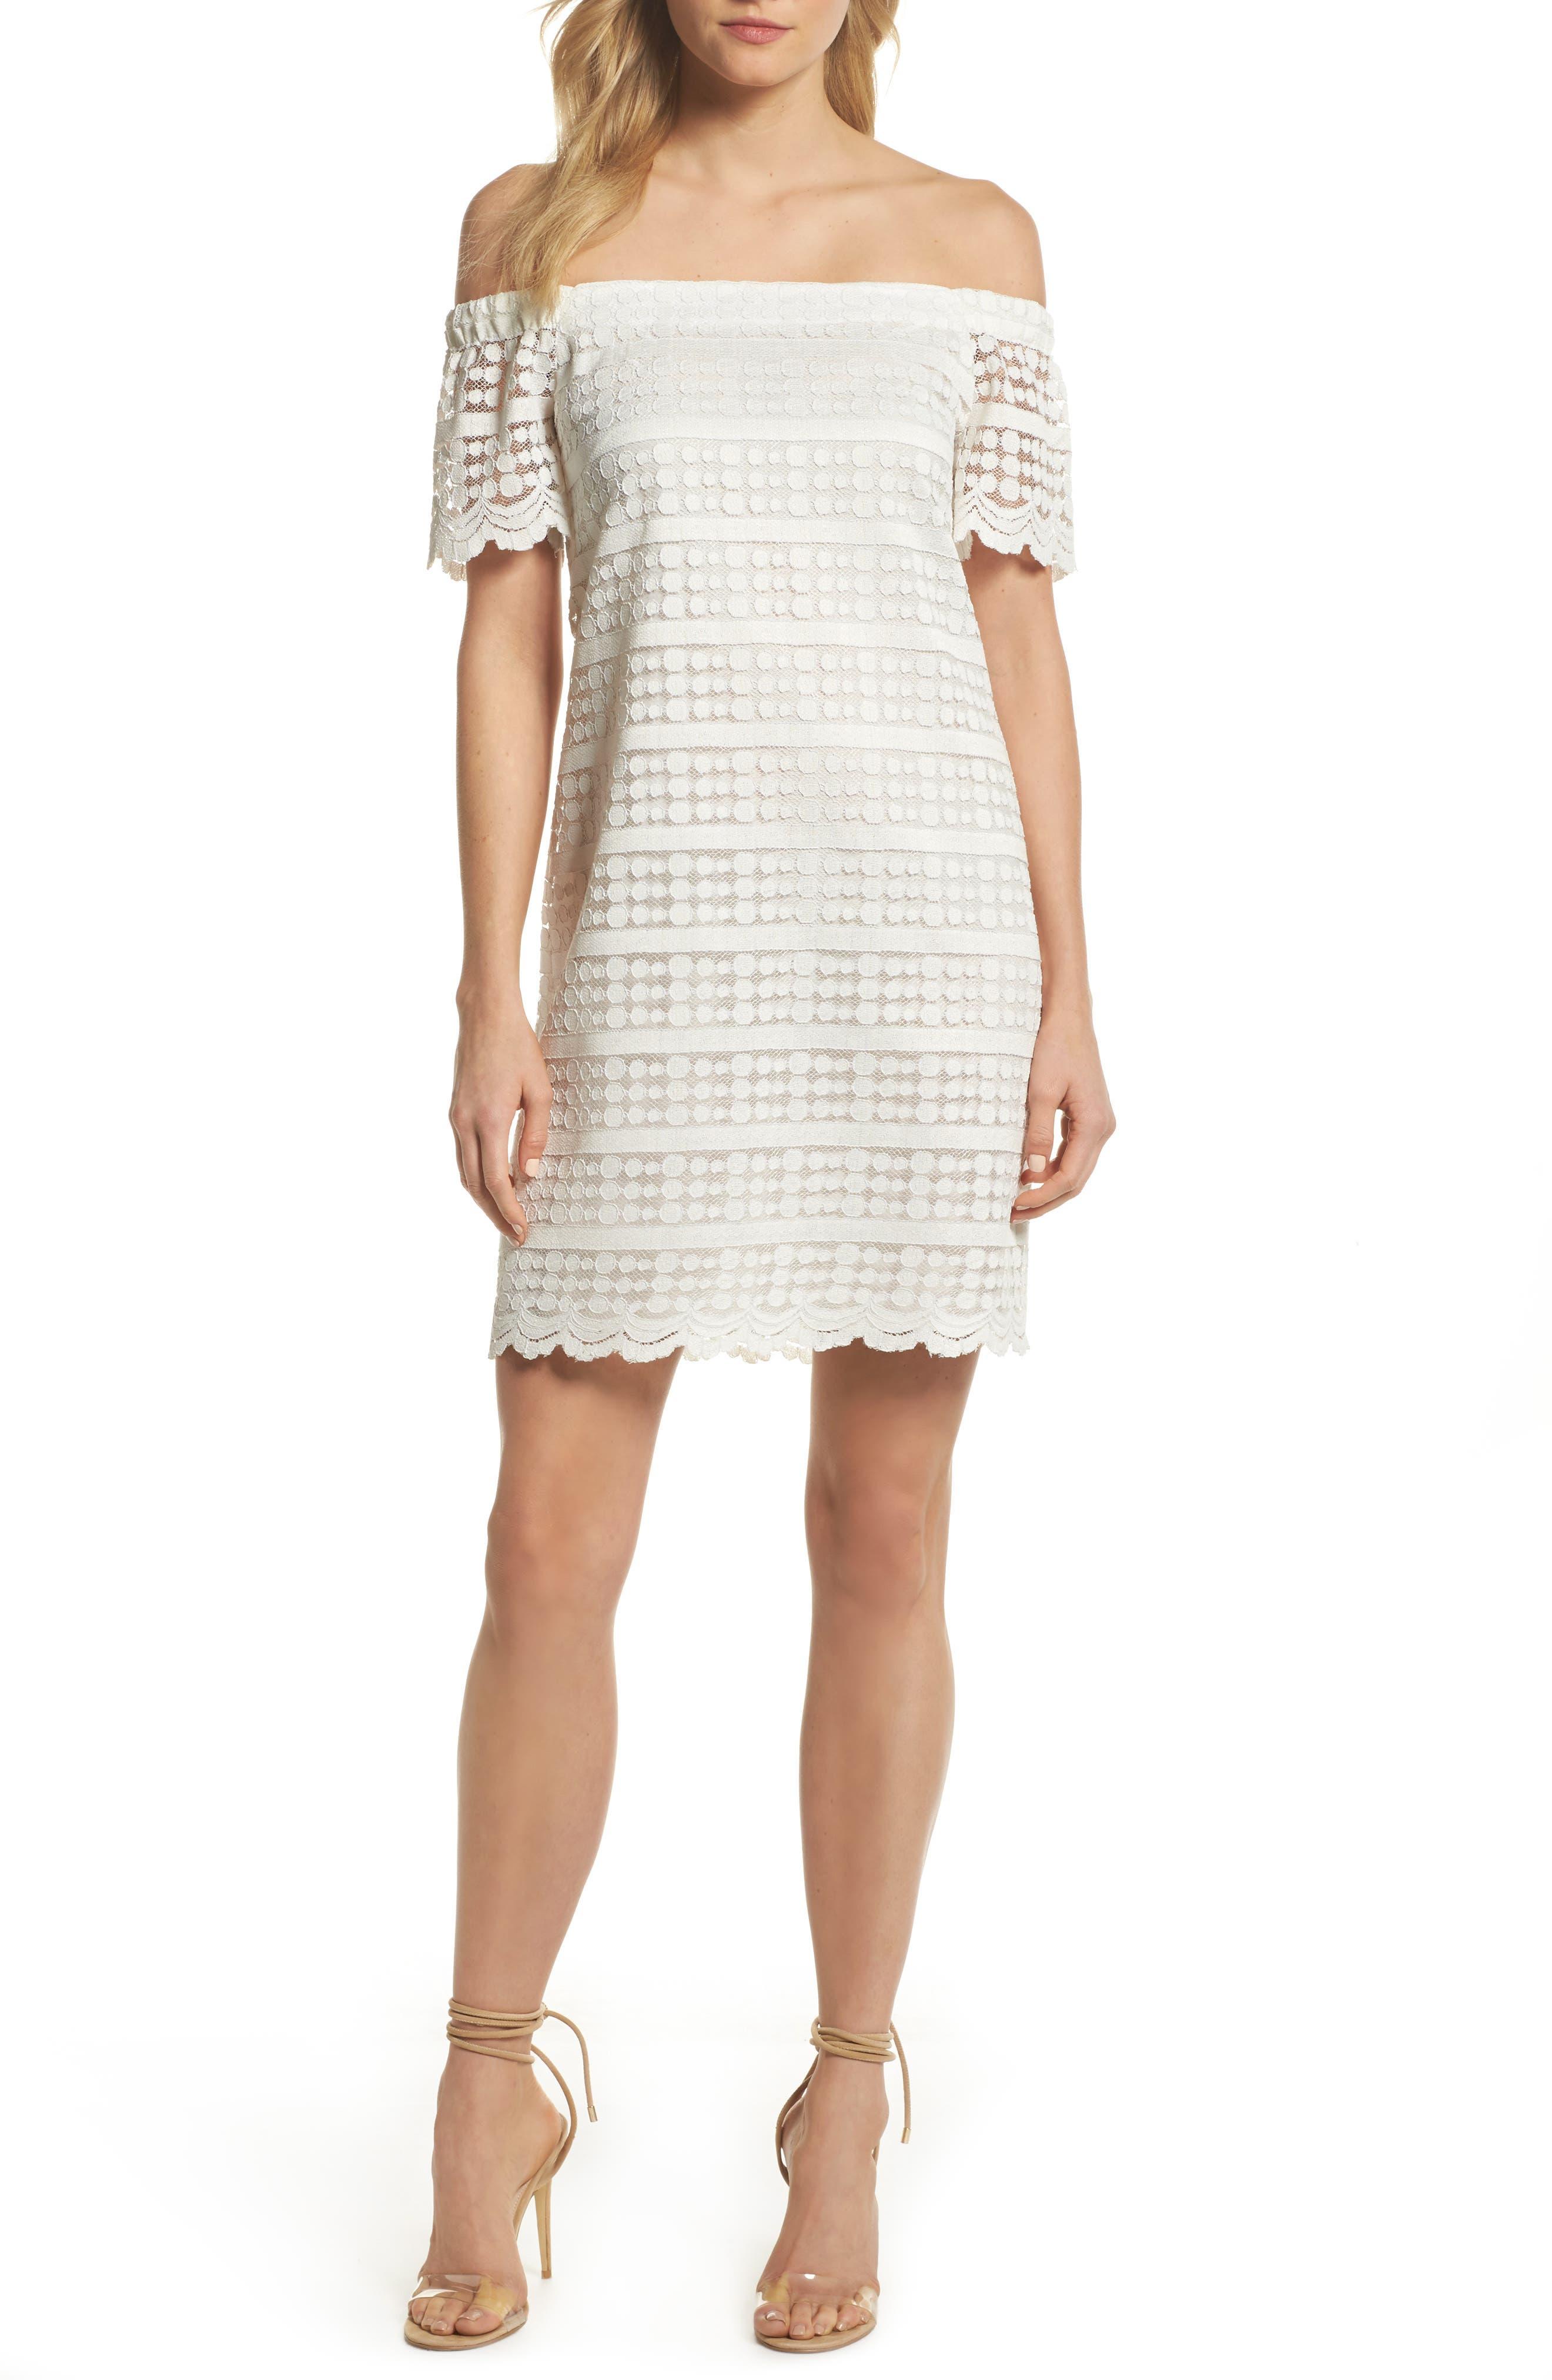 Merengue Off the Shoulder Minidress,                         Main,                         color,